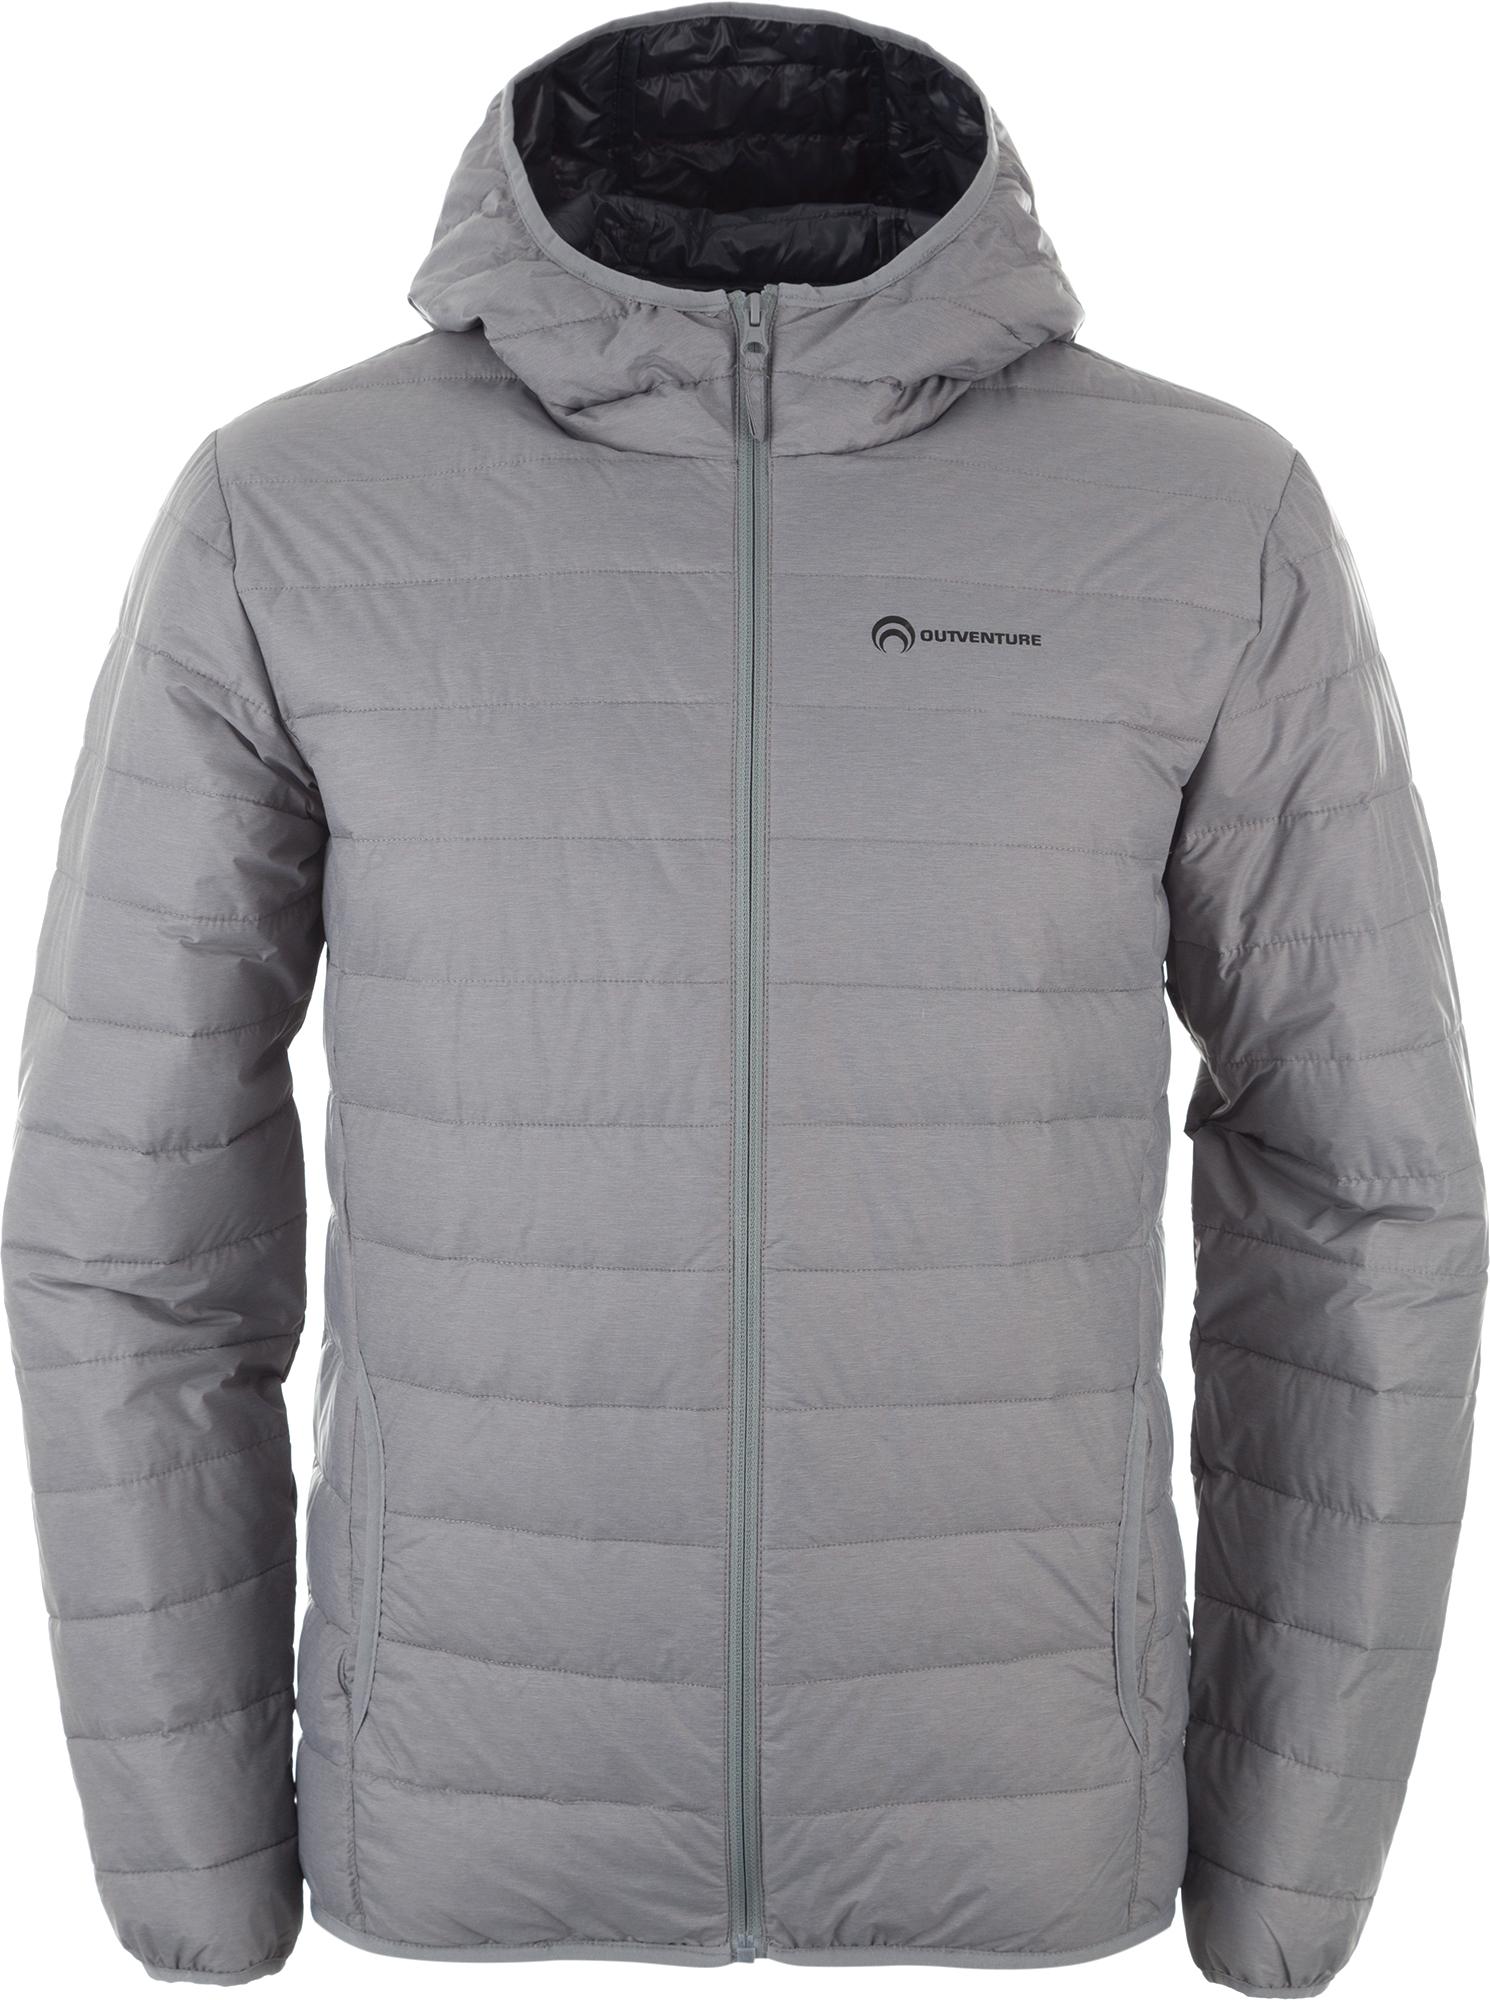 Outventure Куртка пуховая мужская Outventure куртка пуховая arctic goose куртка пуховая